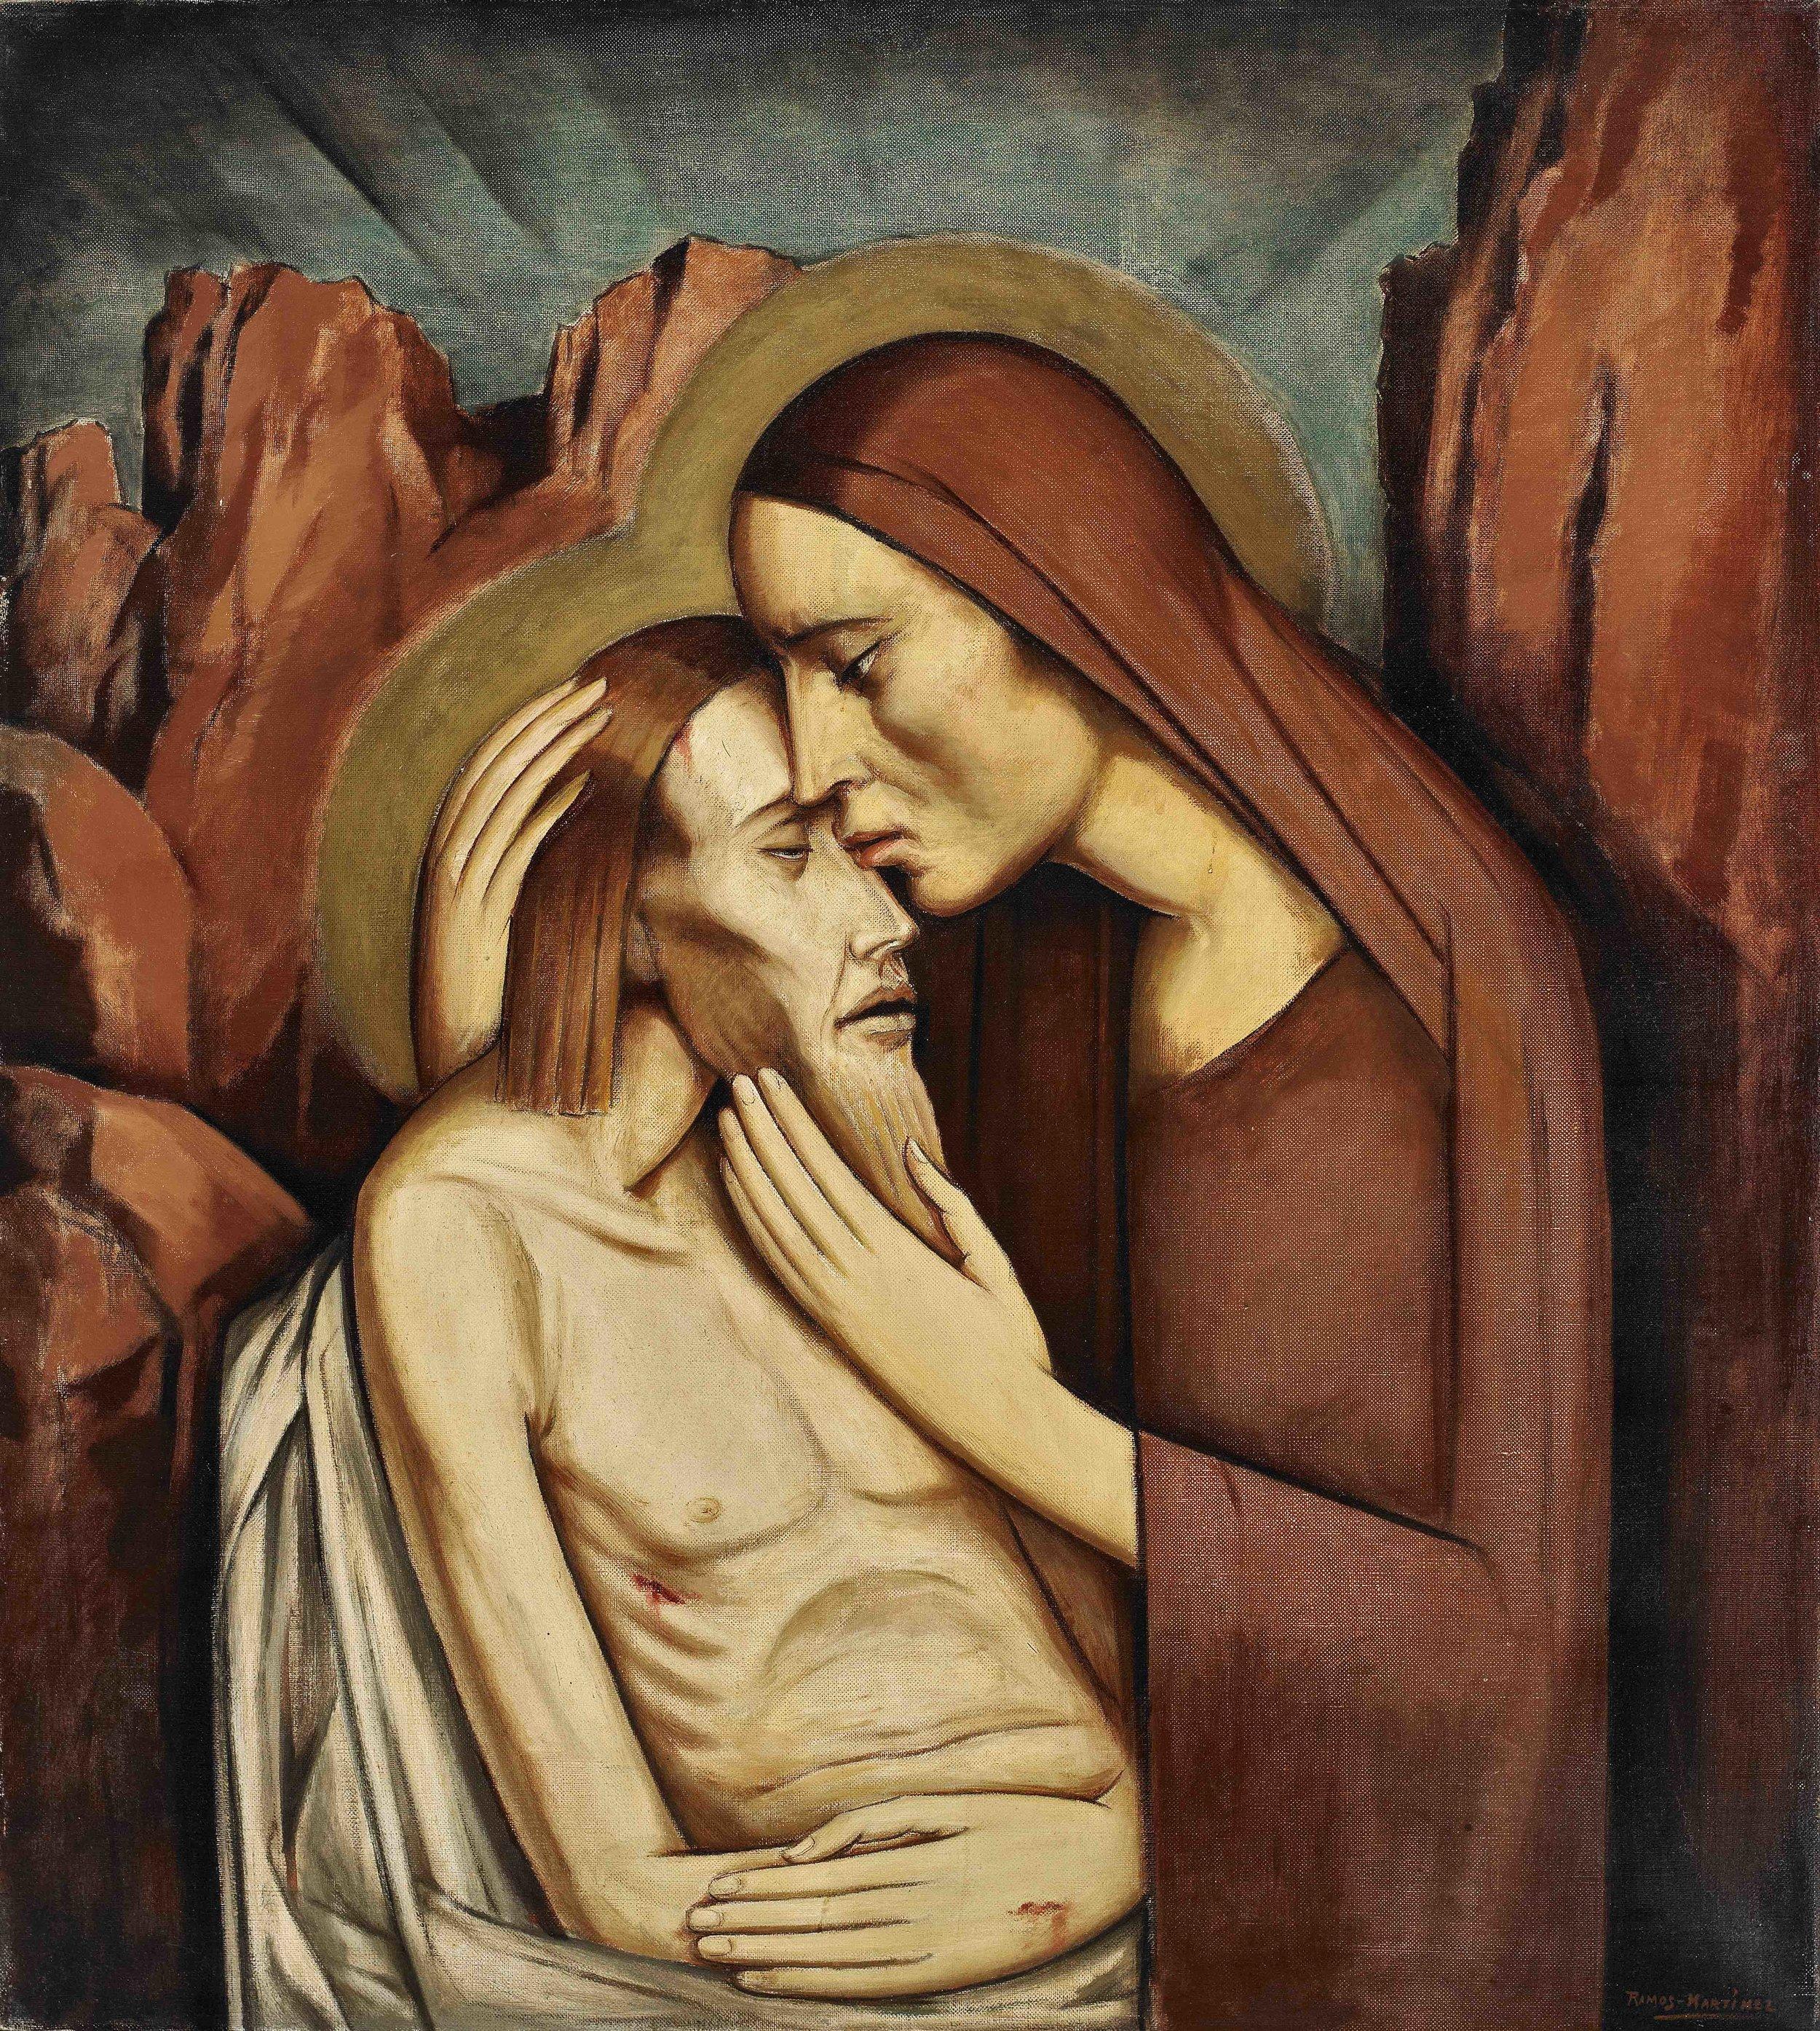 Pietà  ca. 1932 oil on canvas / óleo sobre tela 32 x 28 inches / 81.3 x 71.1 centímetros Private collection